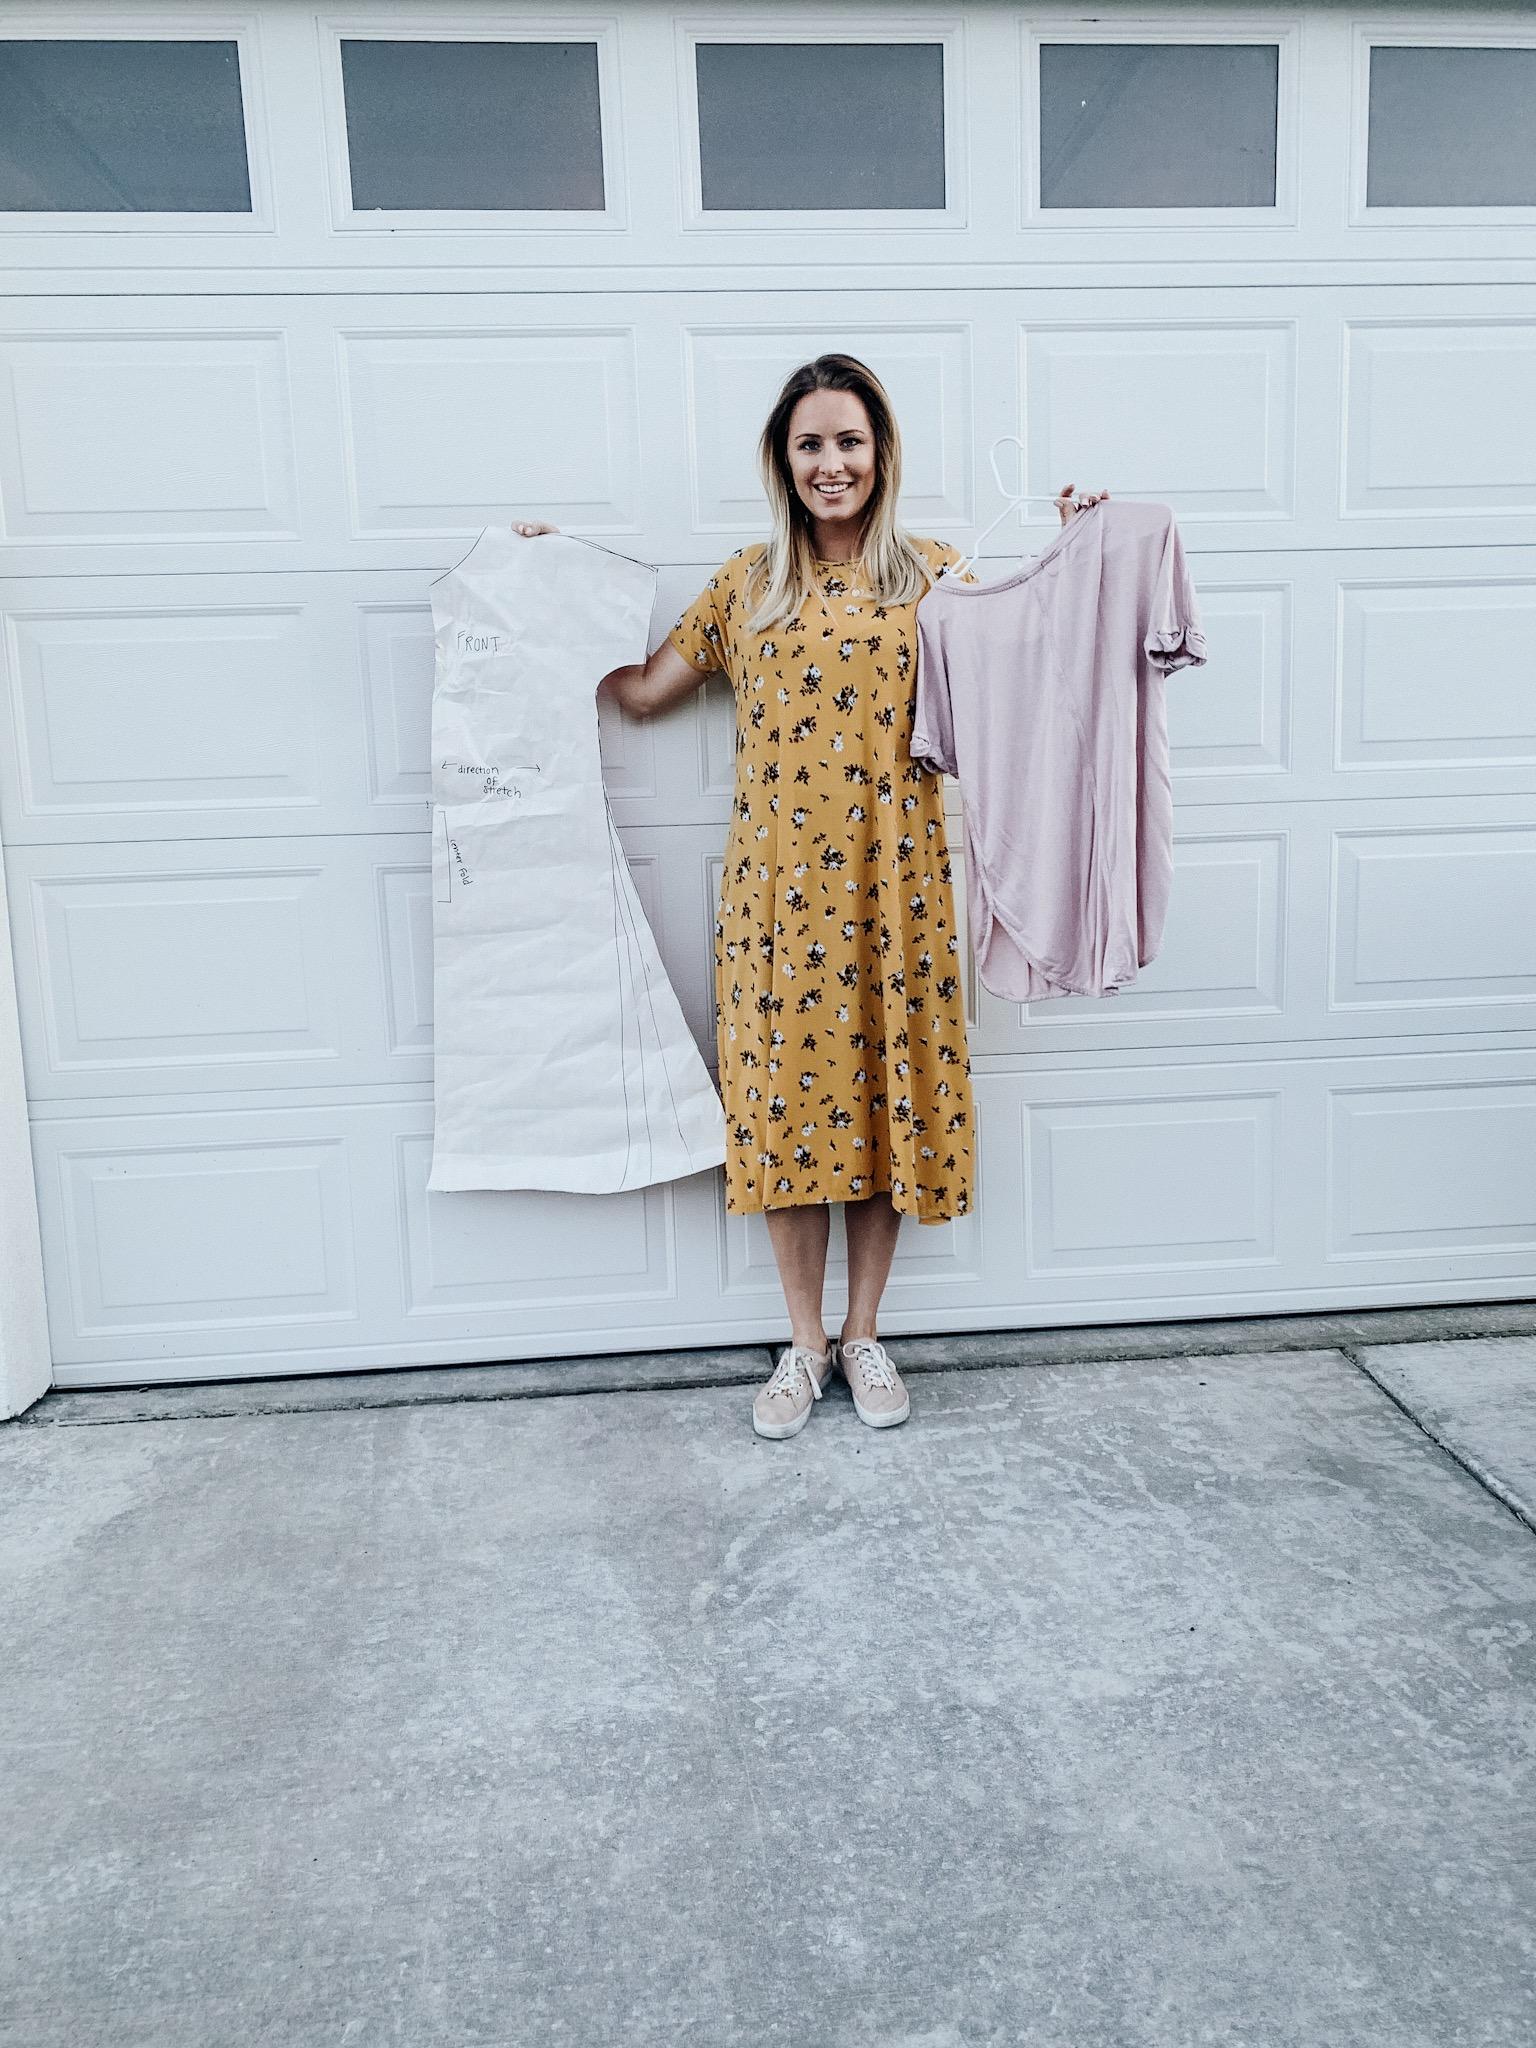 Woman wearing dress, holding dress pattern. | DIY Dress by popular Utah sewing blogger, Kara Metta: image of a woman standing outside and wearing a  yellow floral DIY t-shirt dress.